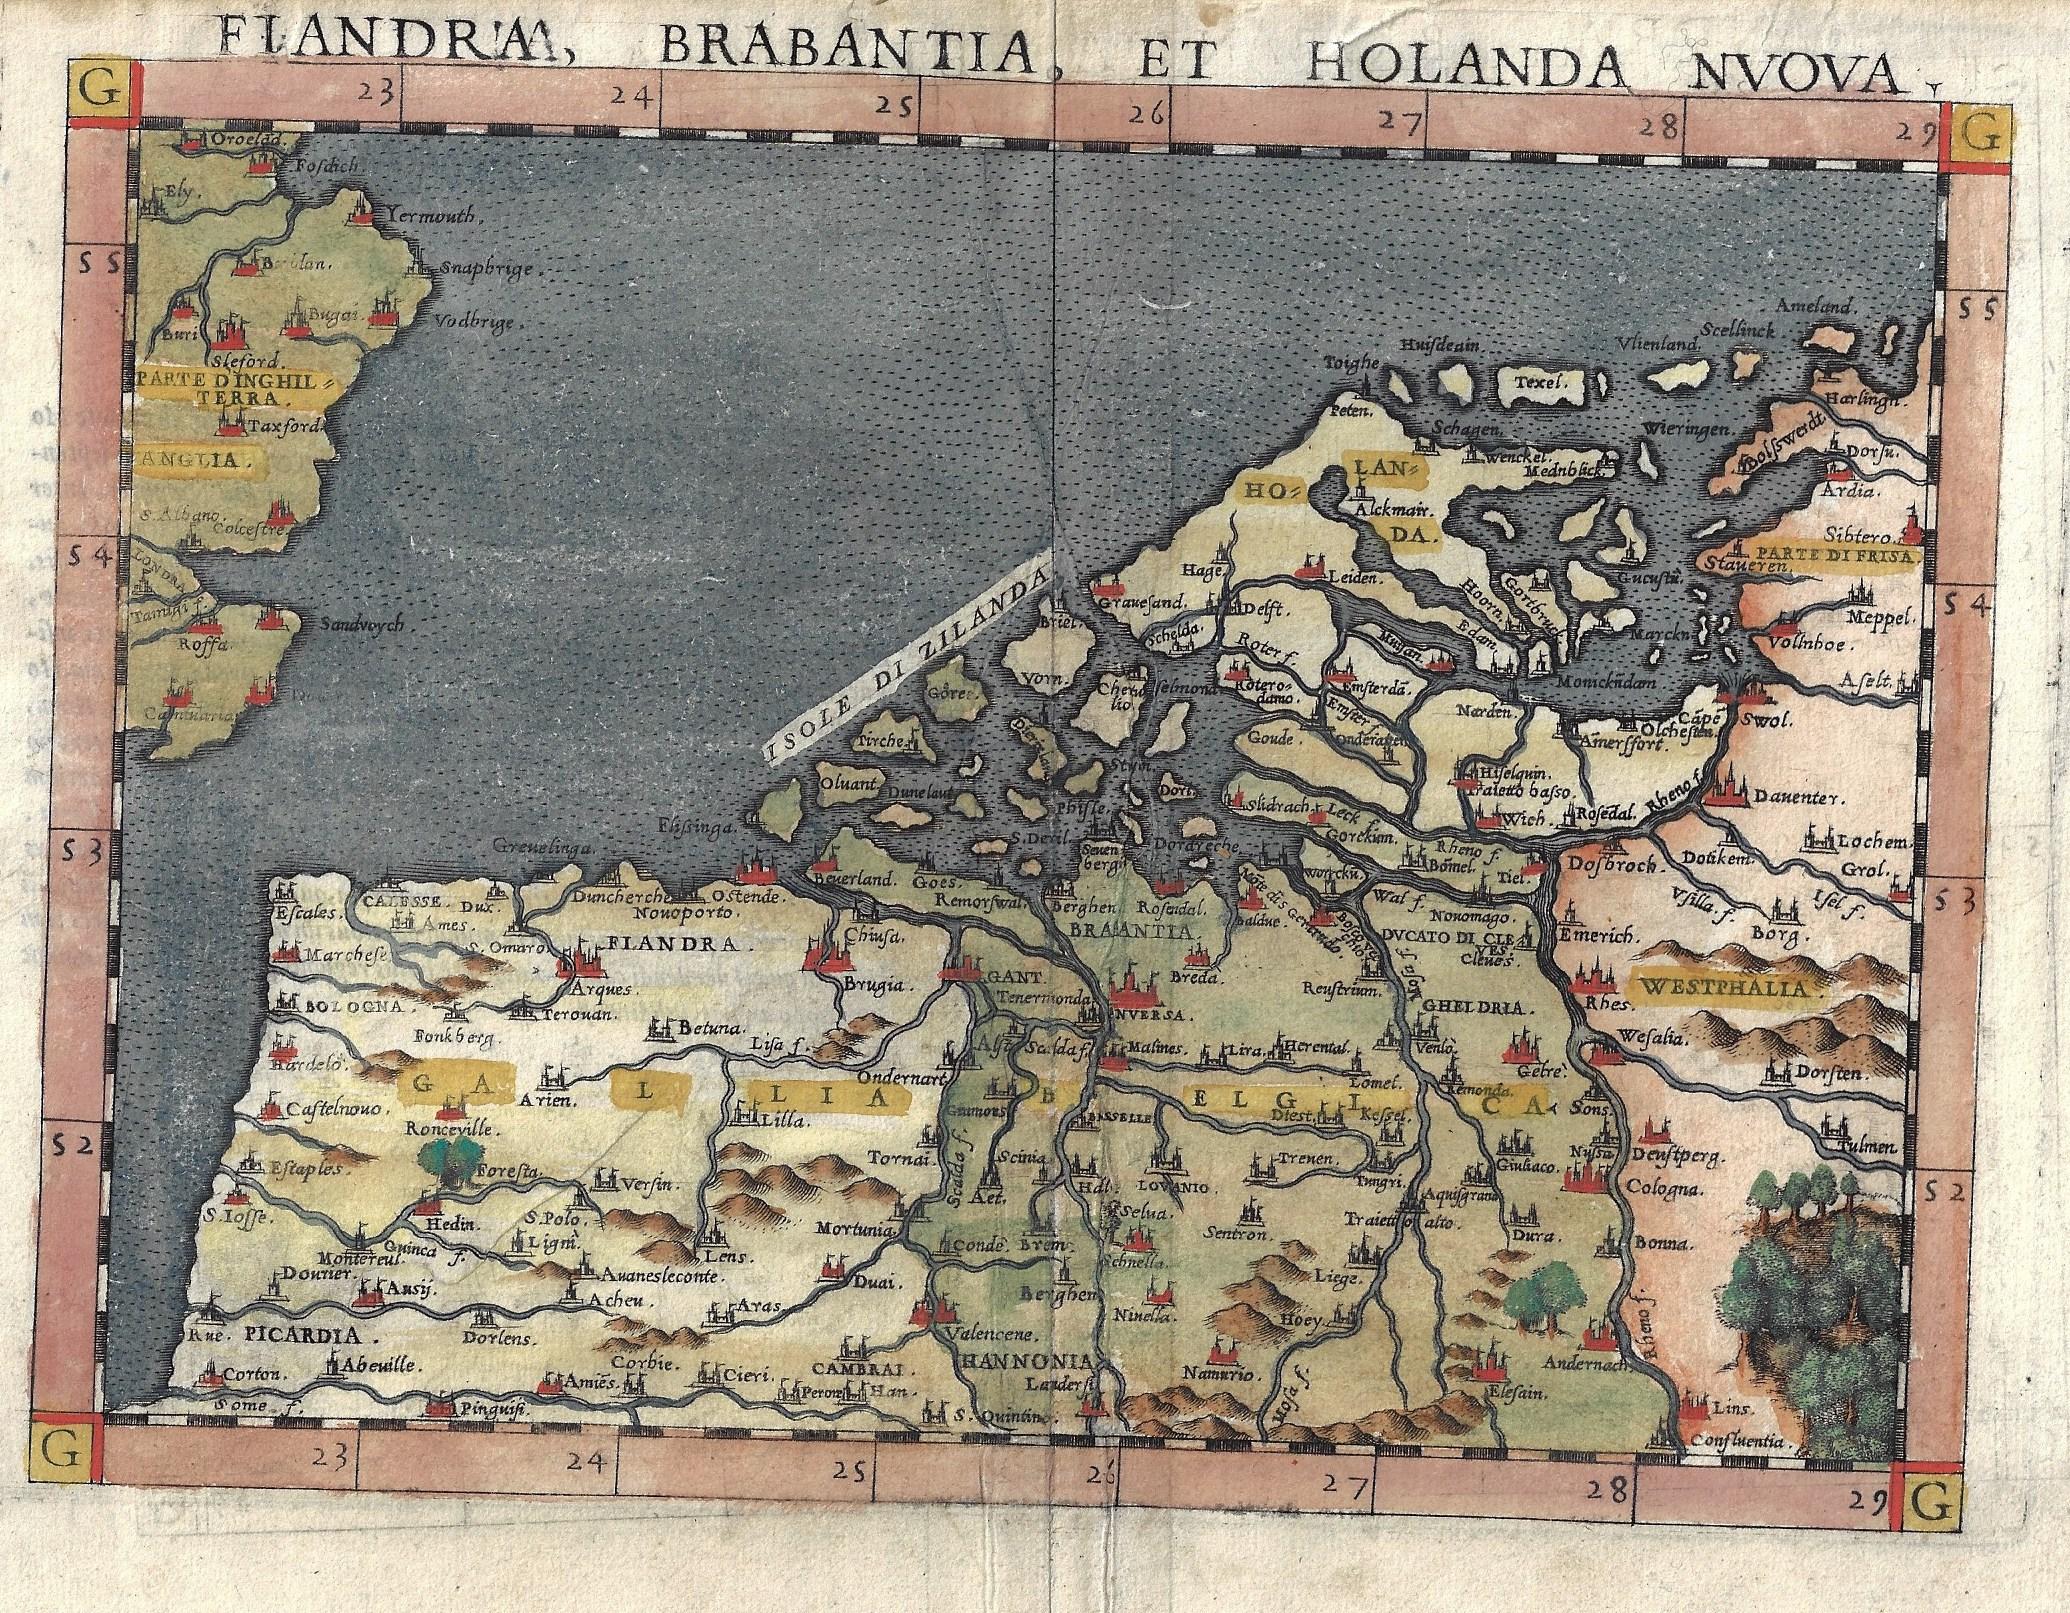 Ruscelli  Flandria, Brabantia, et Holanda Nuova.